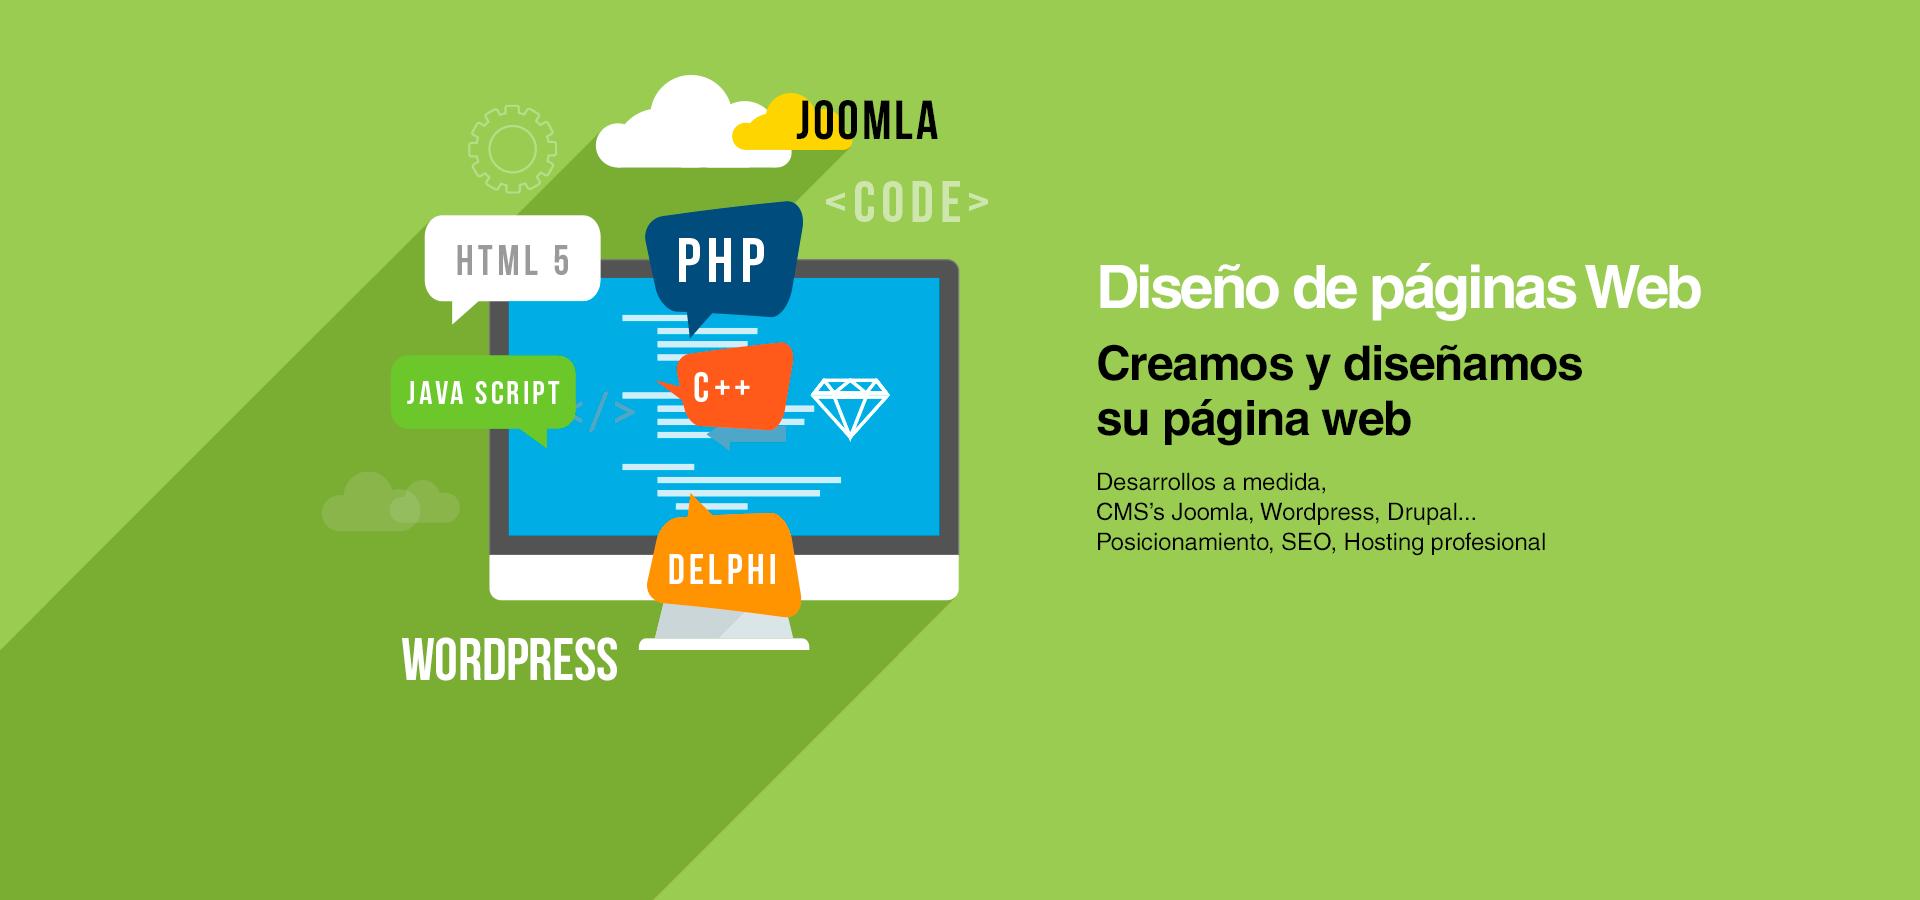 infopymemurcia-servicios-diseno-web